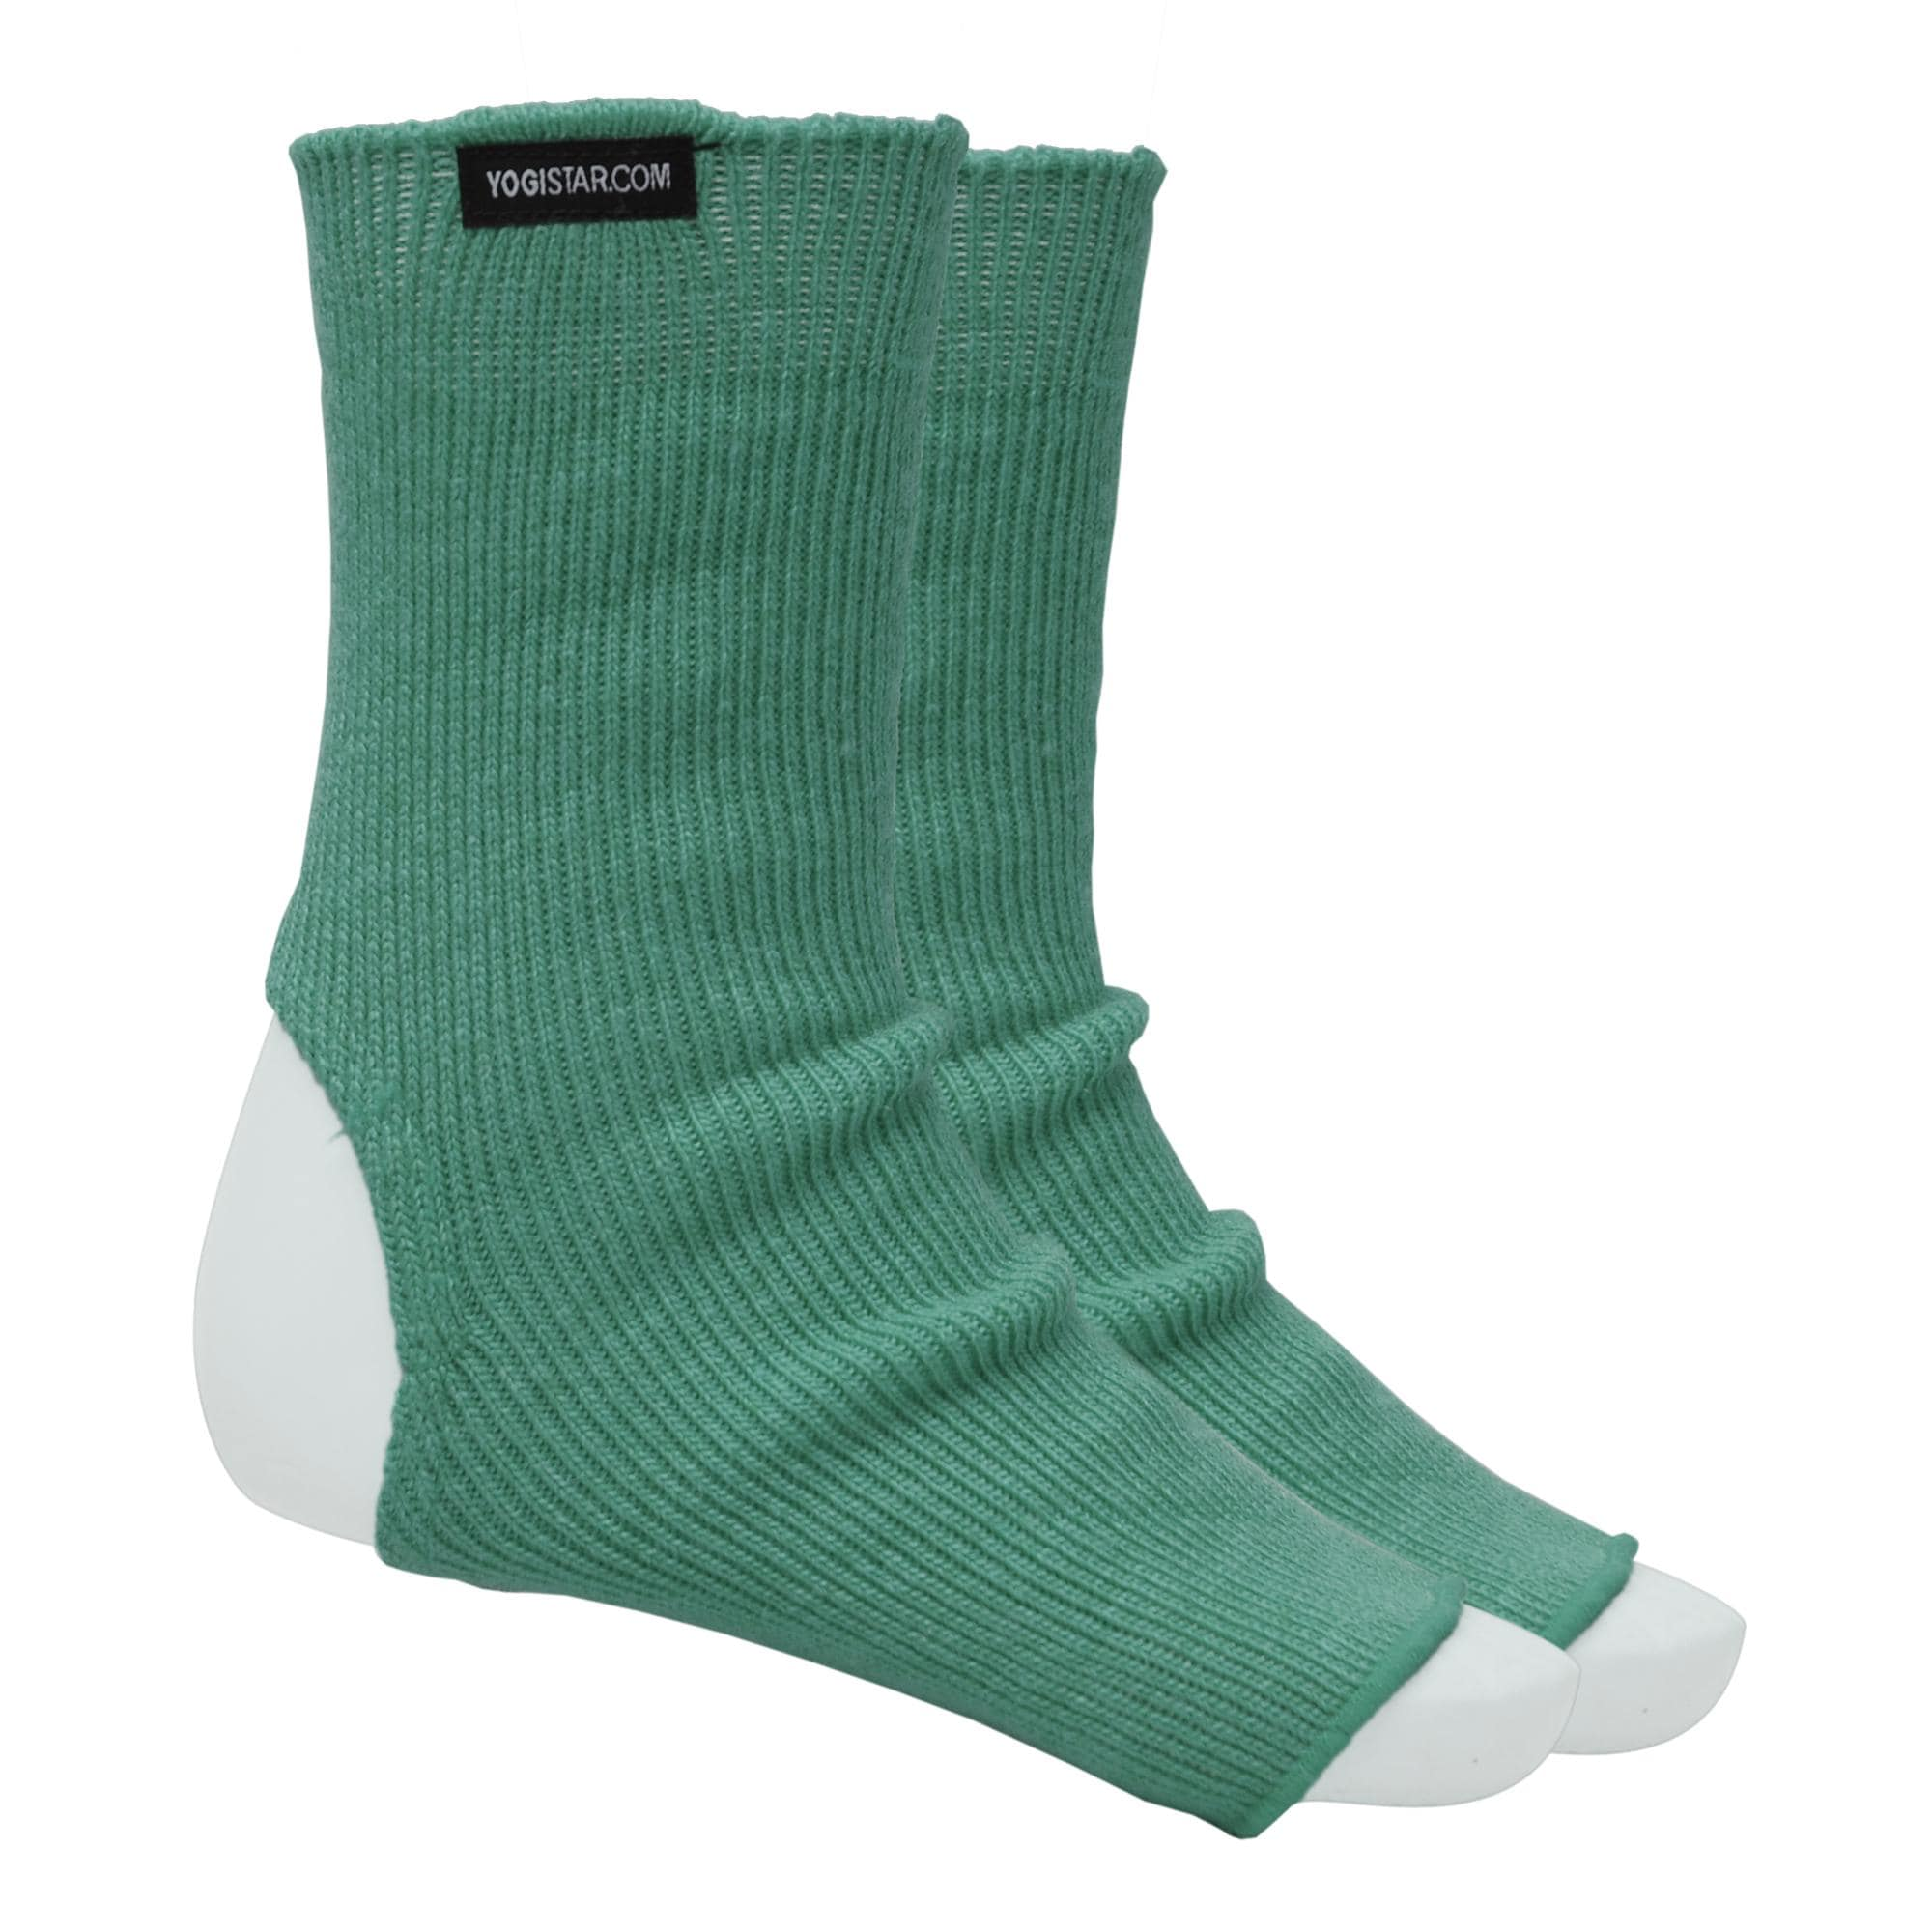 yogistar Yoga-Socken emerald green